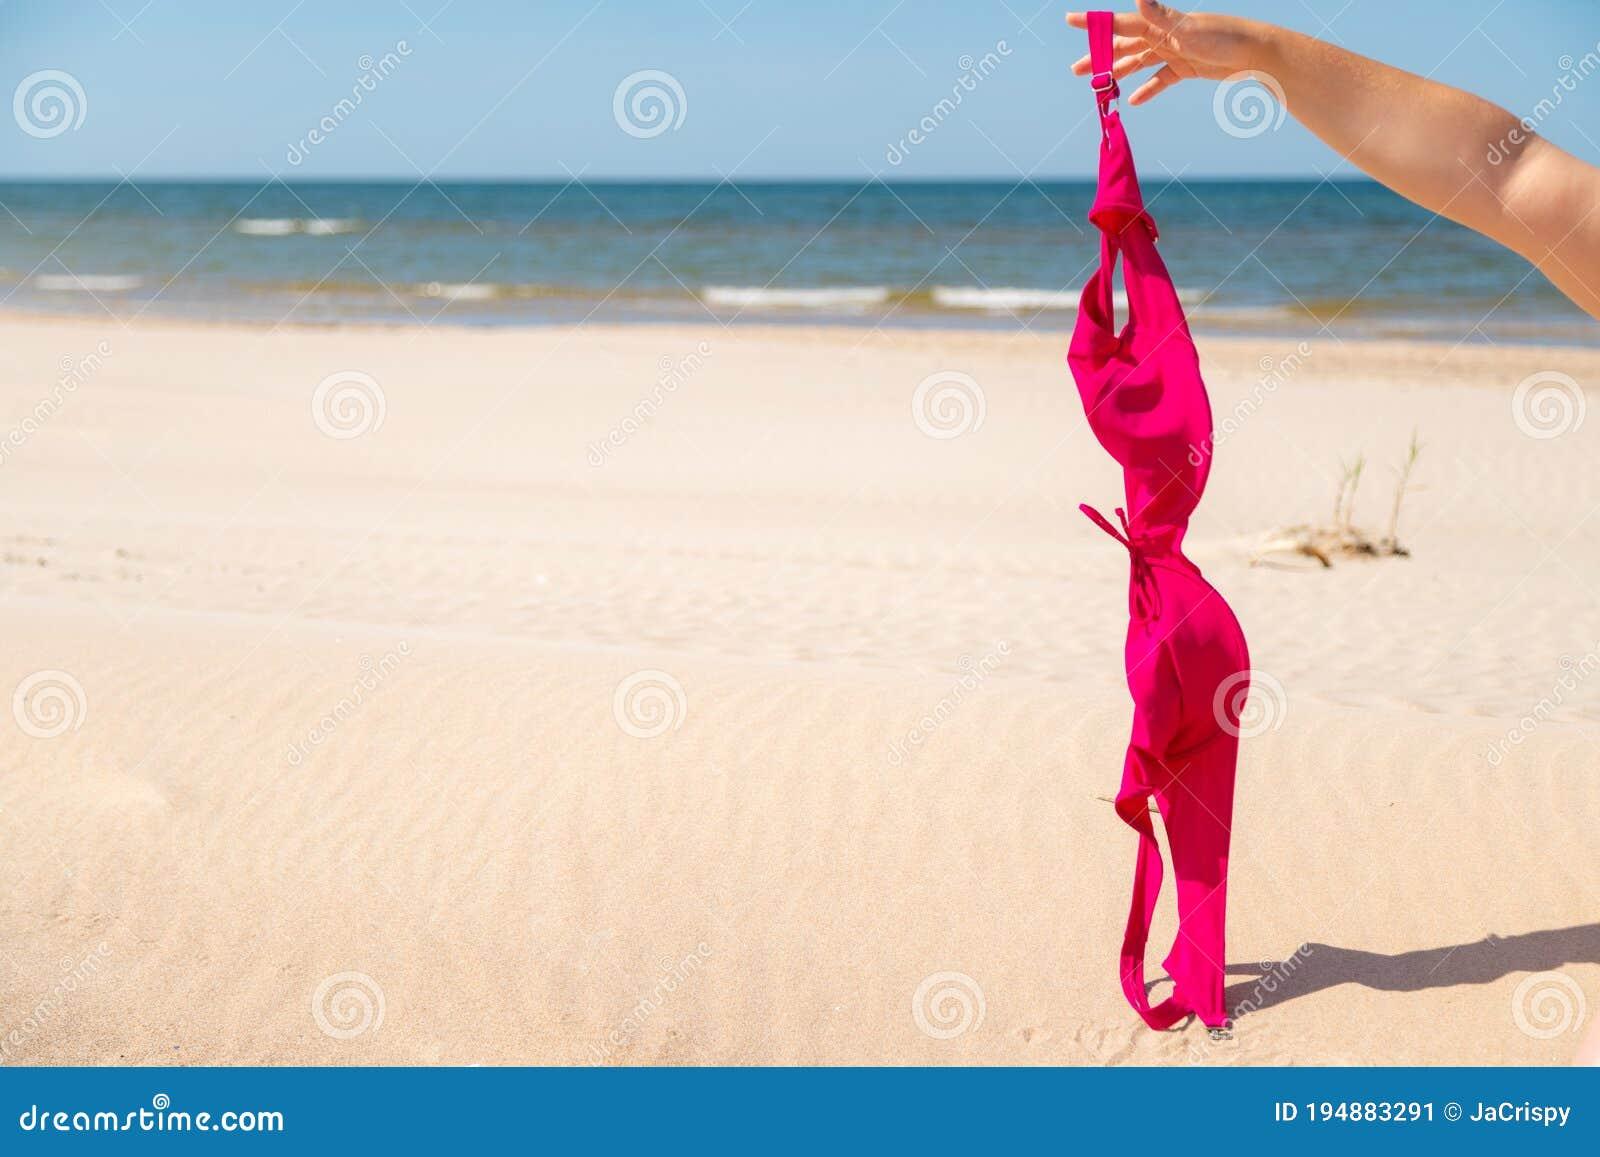 Nude beach naked Nude beach